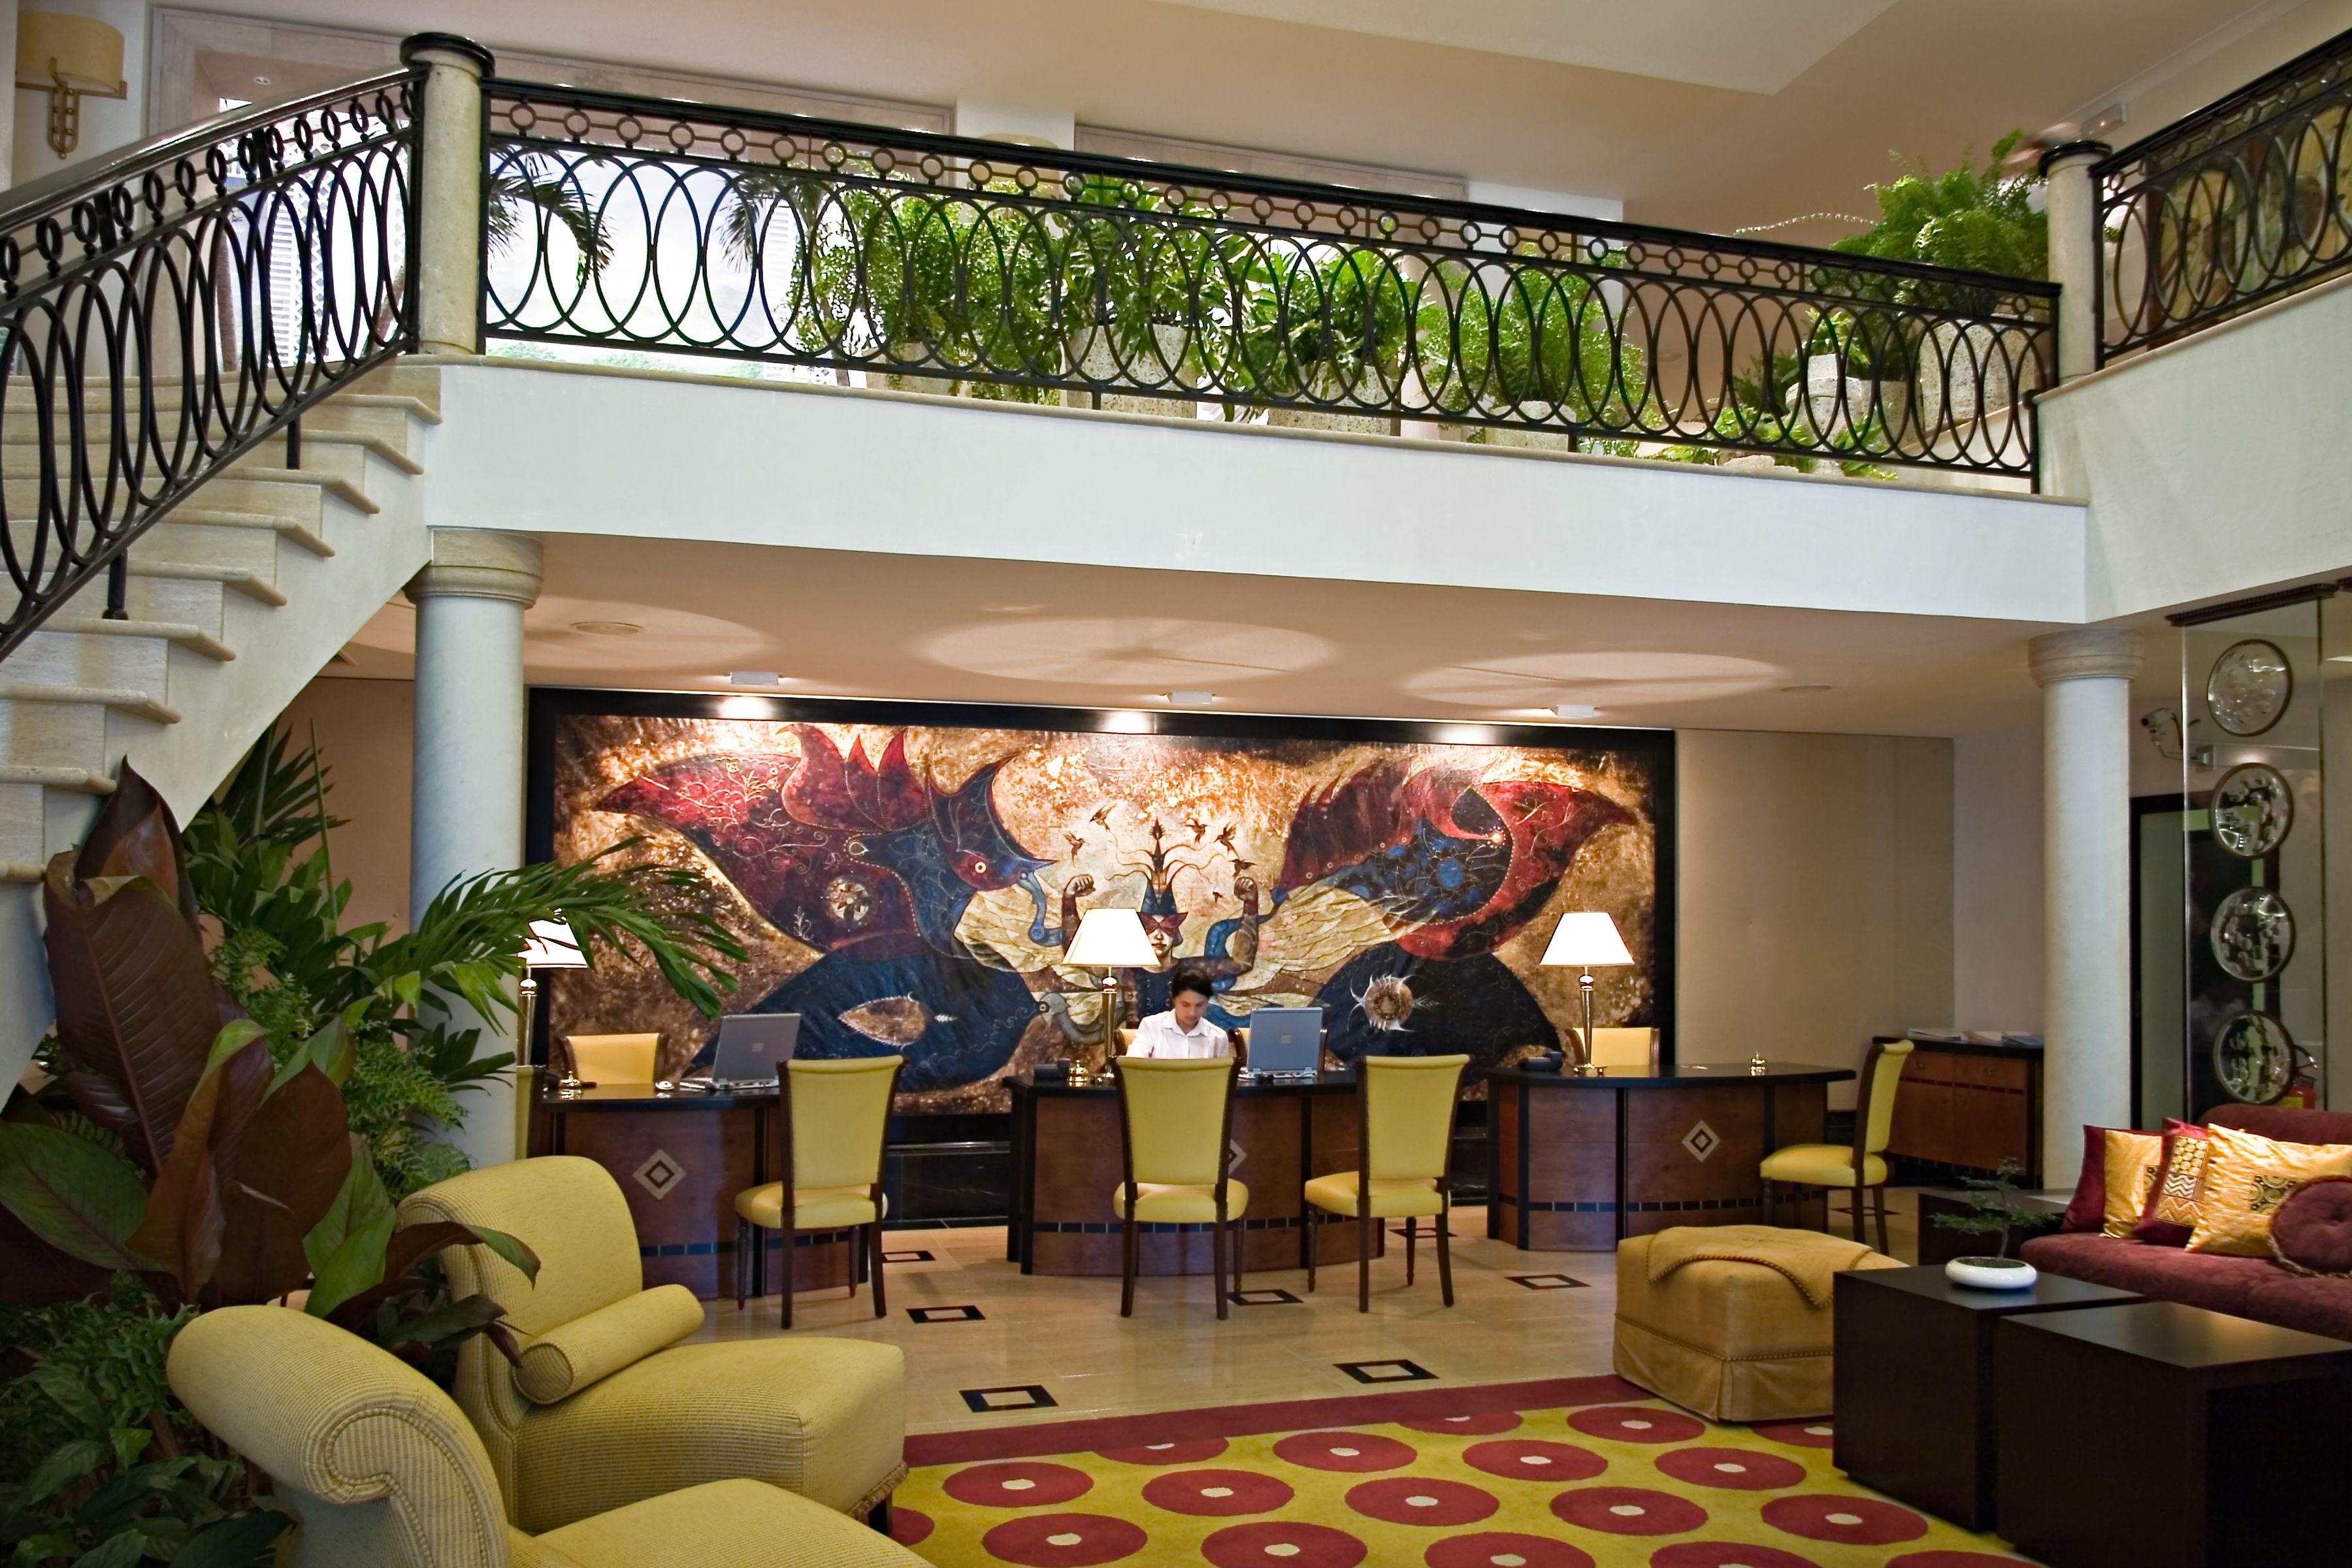 Hotel Saratoga Recepcion C Arquitectura De Interiores Escalera De Marmol Marble Stairway Cuban Art Area Rug Receptio Interior Interior Design Design